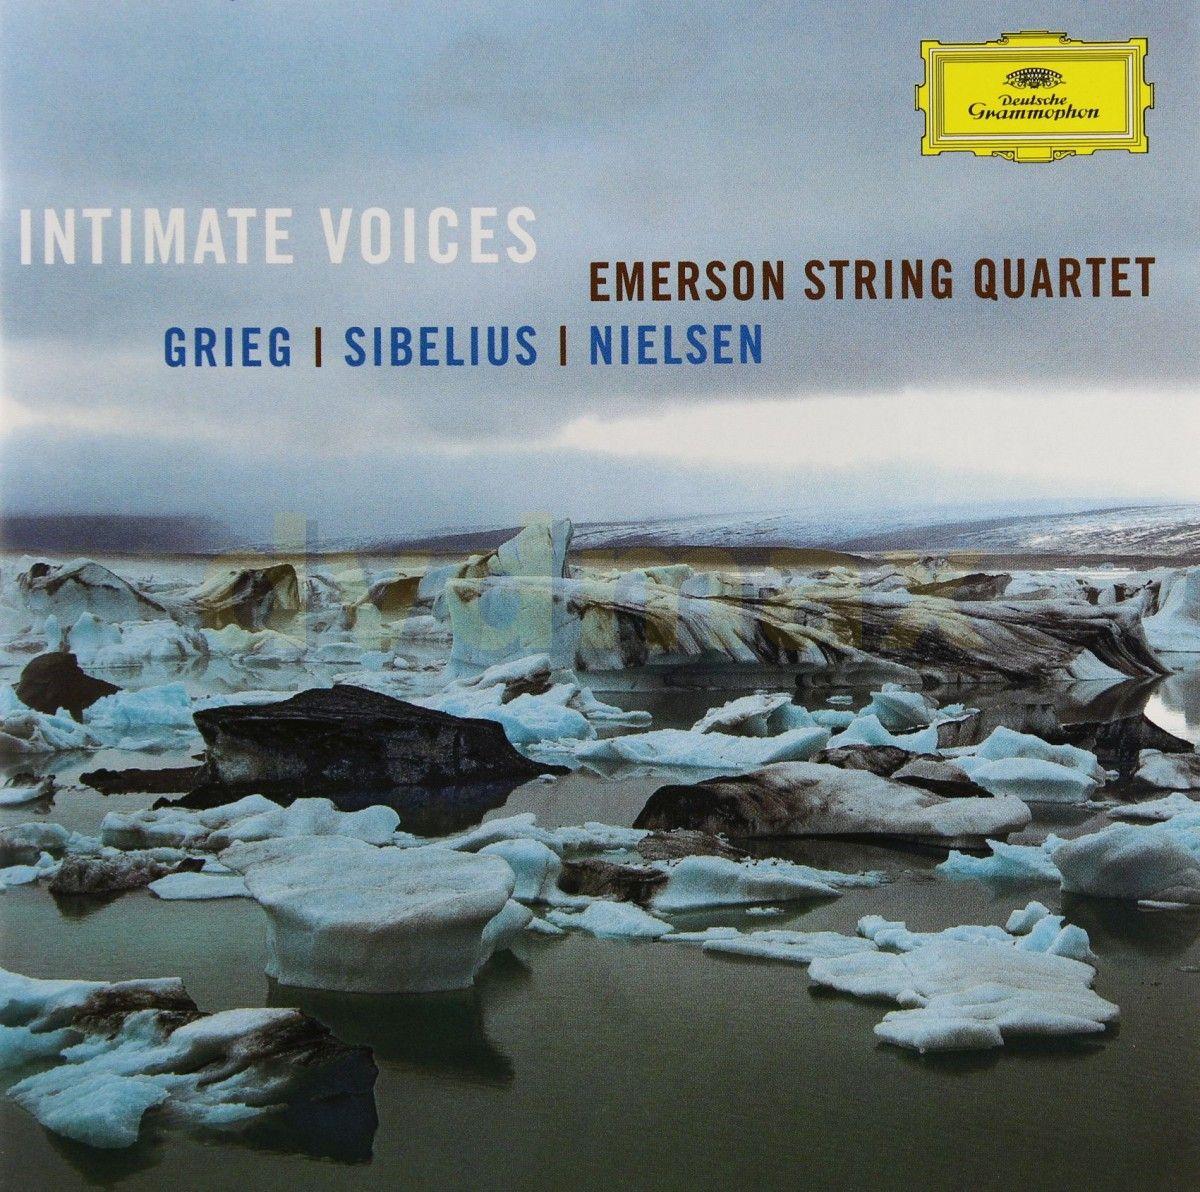 Emerson String Quartet // DGG 477 5960 - Recorded 2004